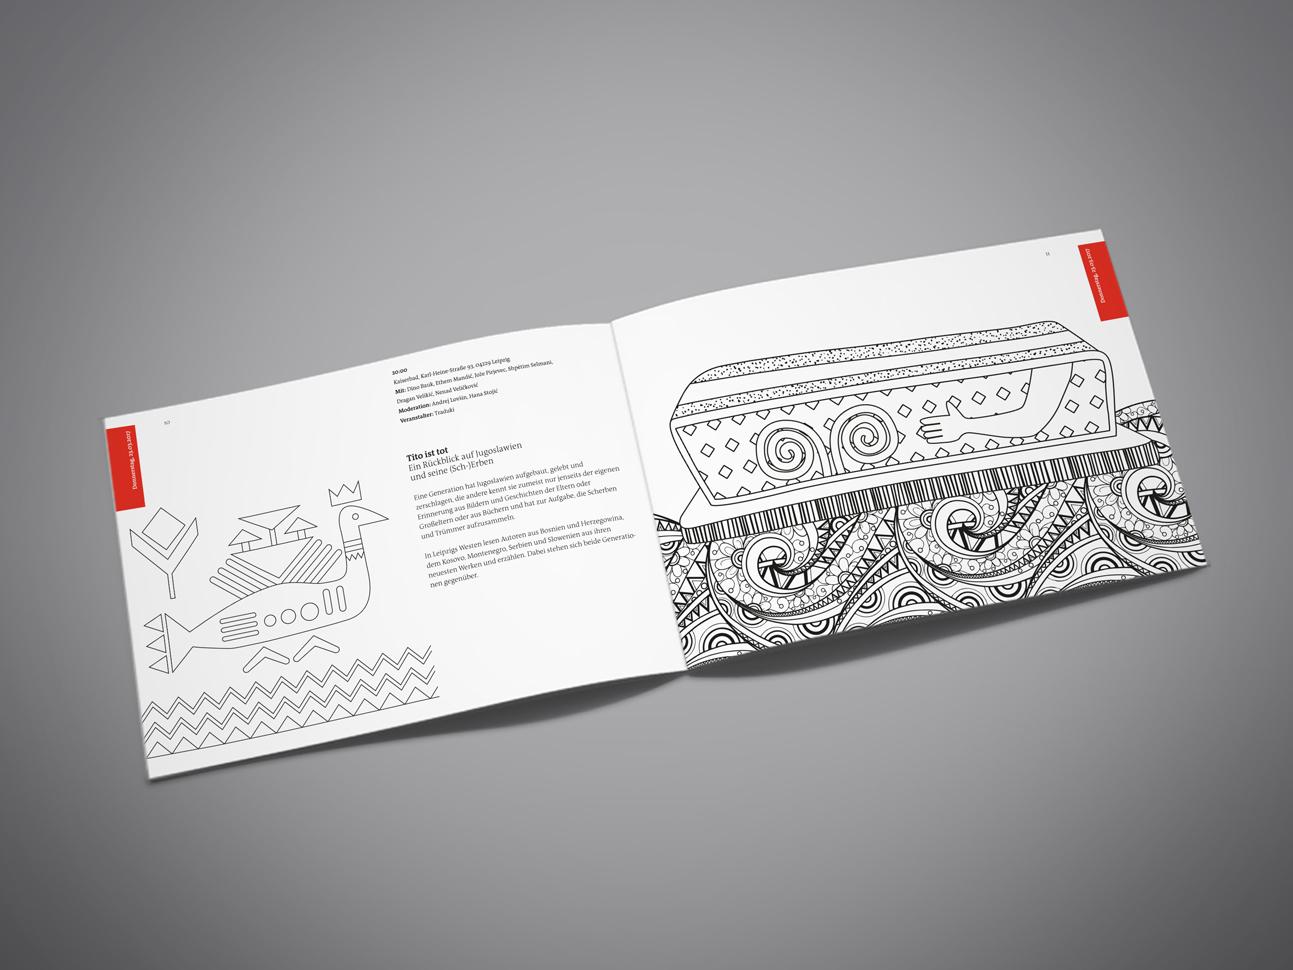 martin_zech_design_projekt_design_traduki_messestand_leipziger_buchmesse_2017_programmheft_doppelseite